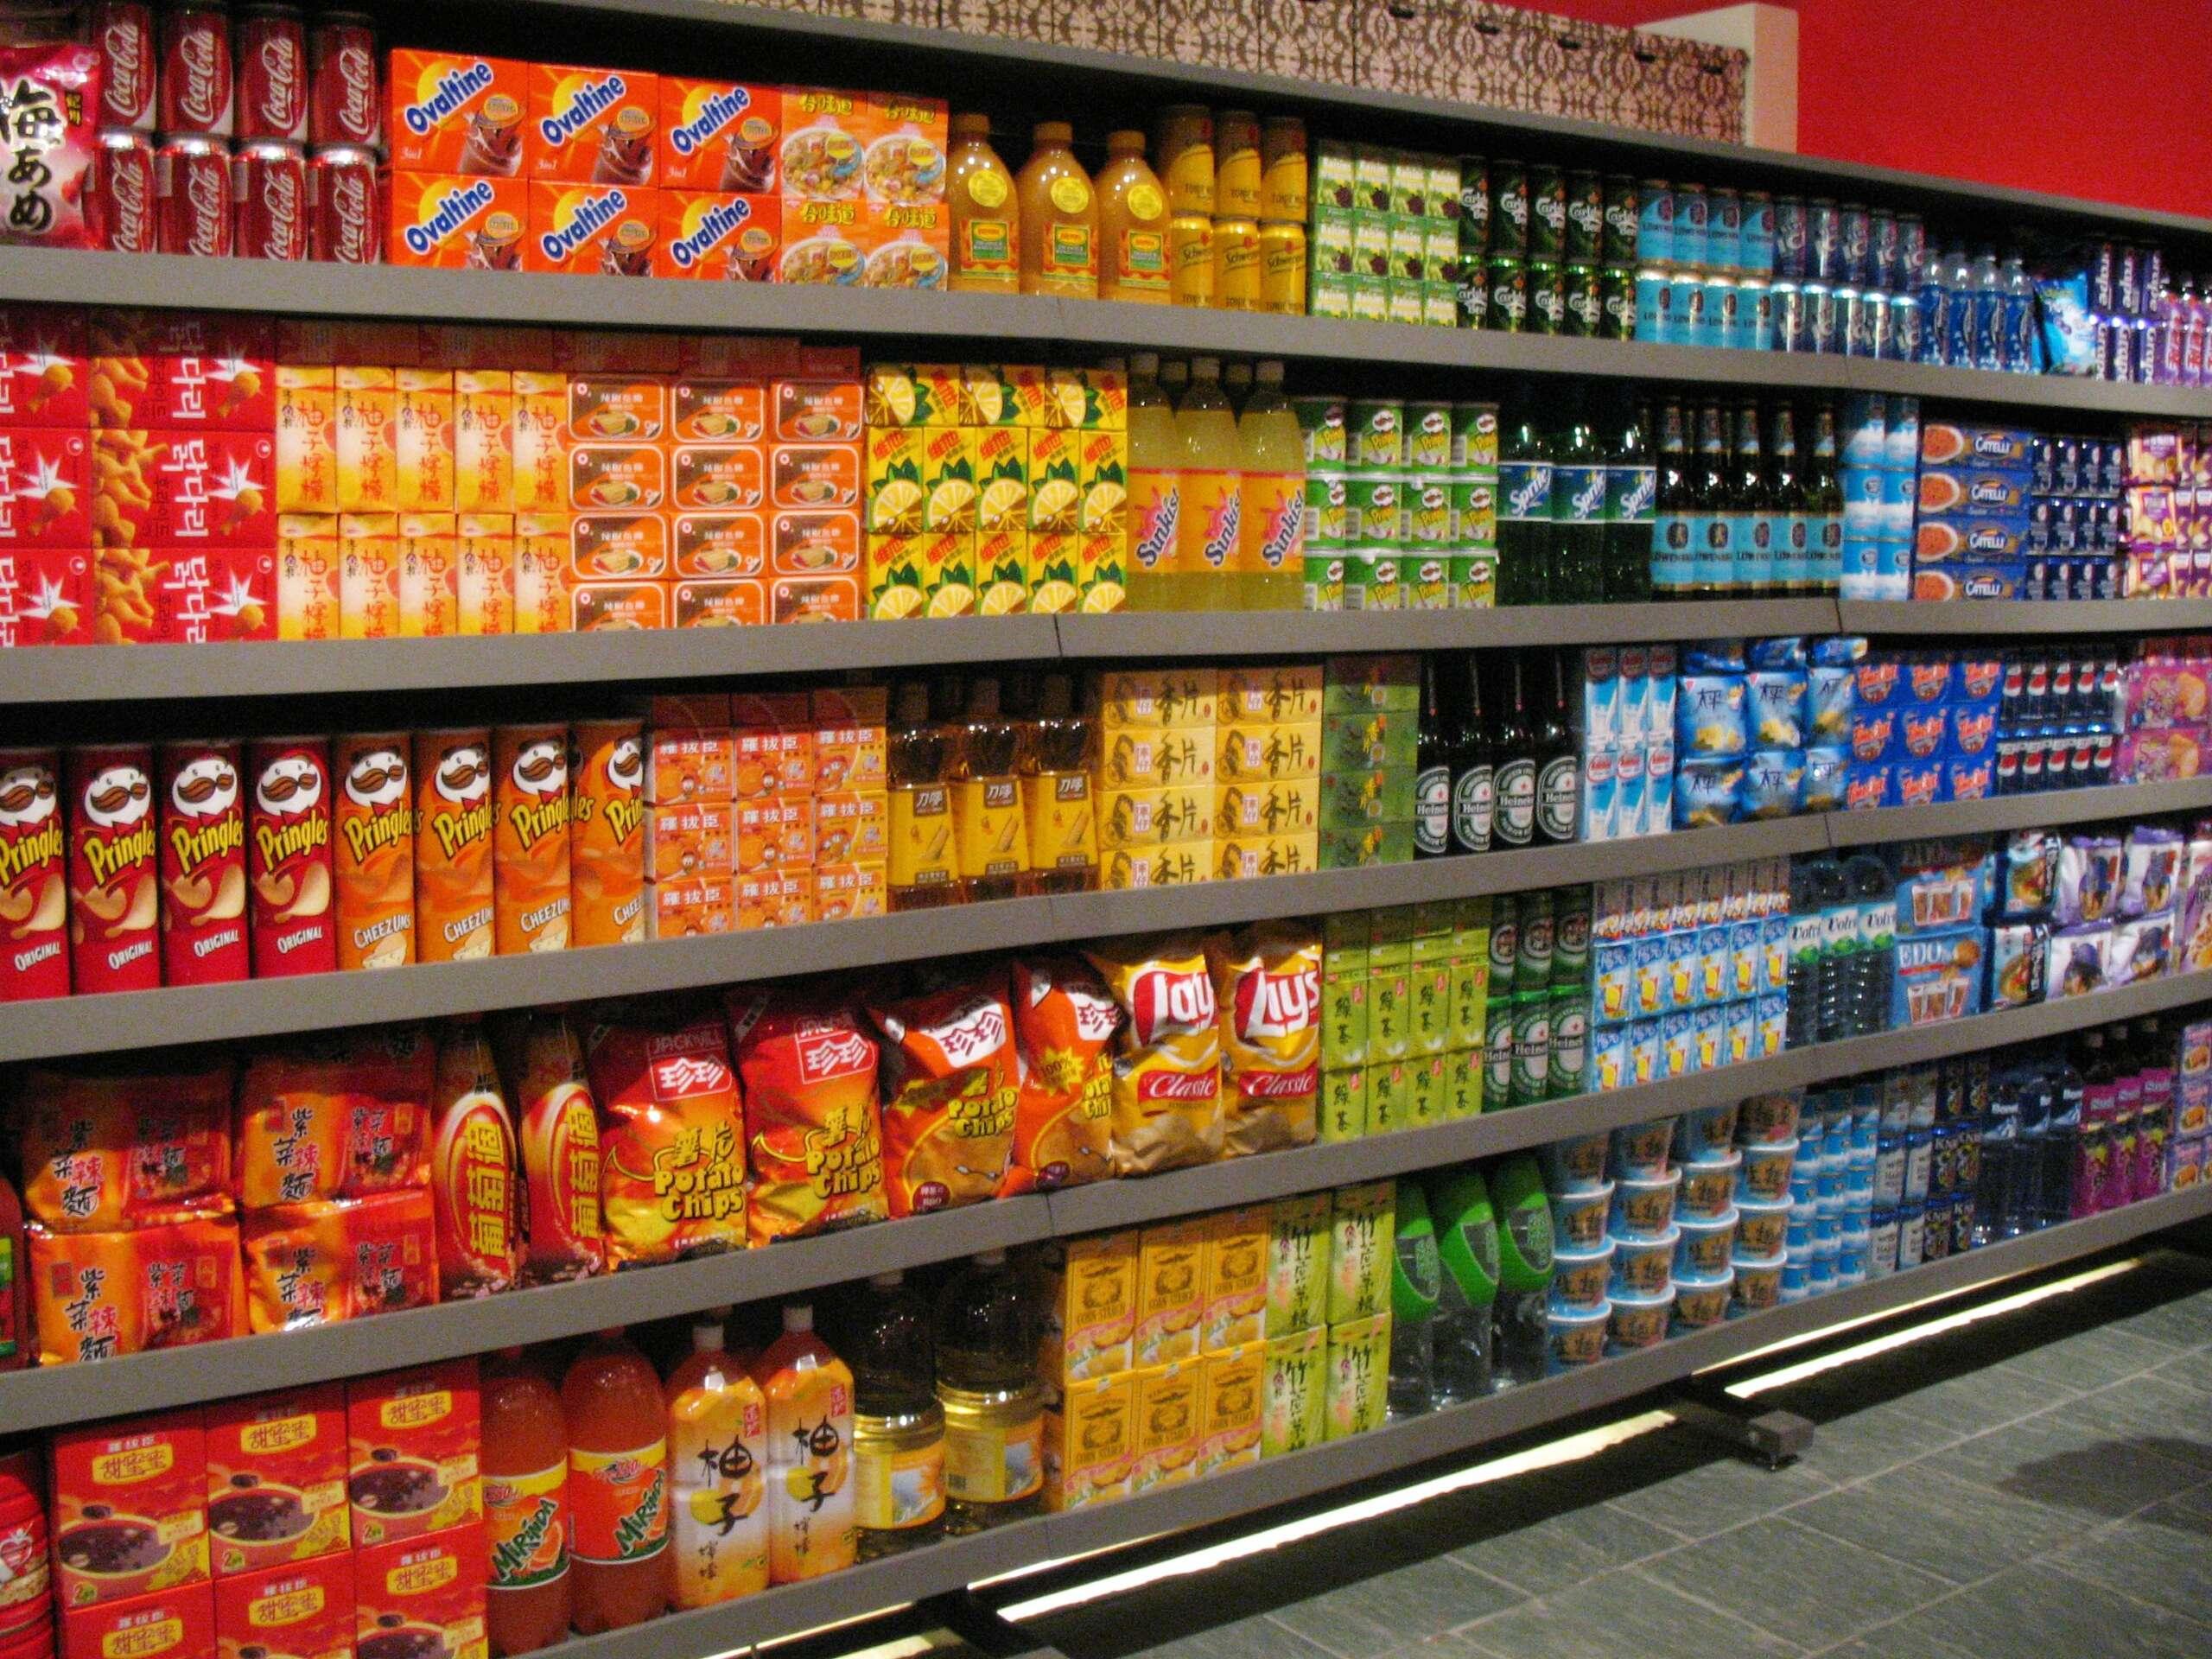 Endcap: 4 Important Benefits of EndCap in Retail Merchandising